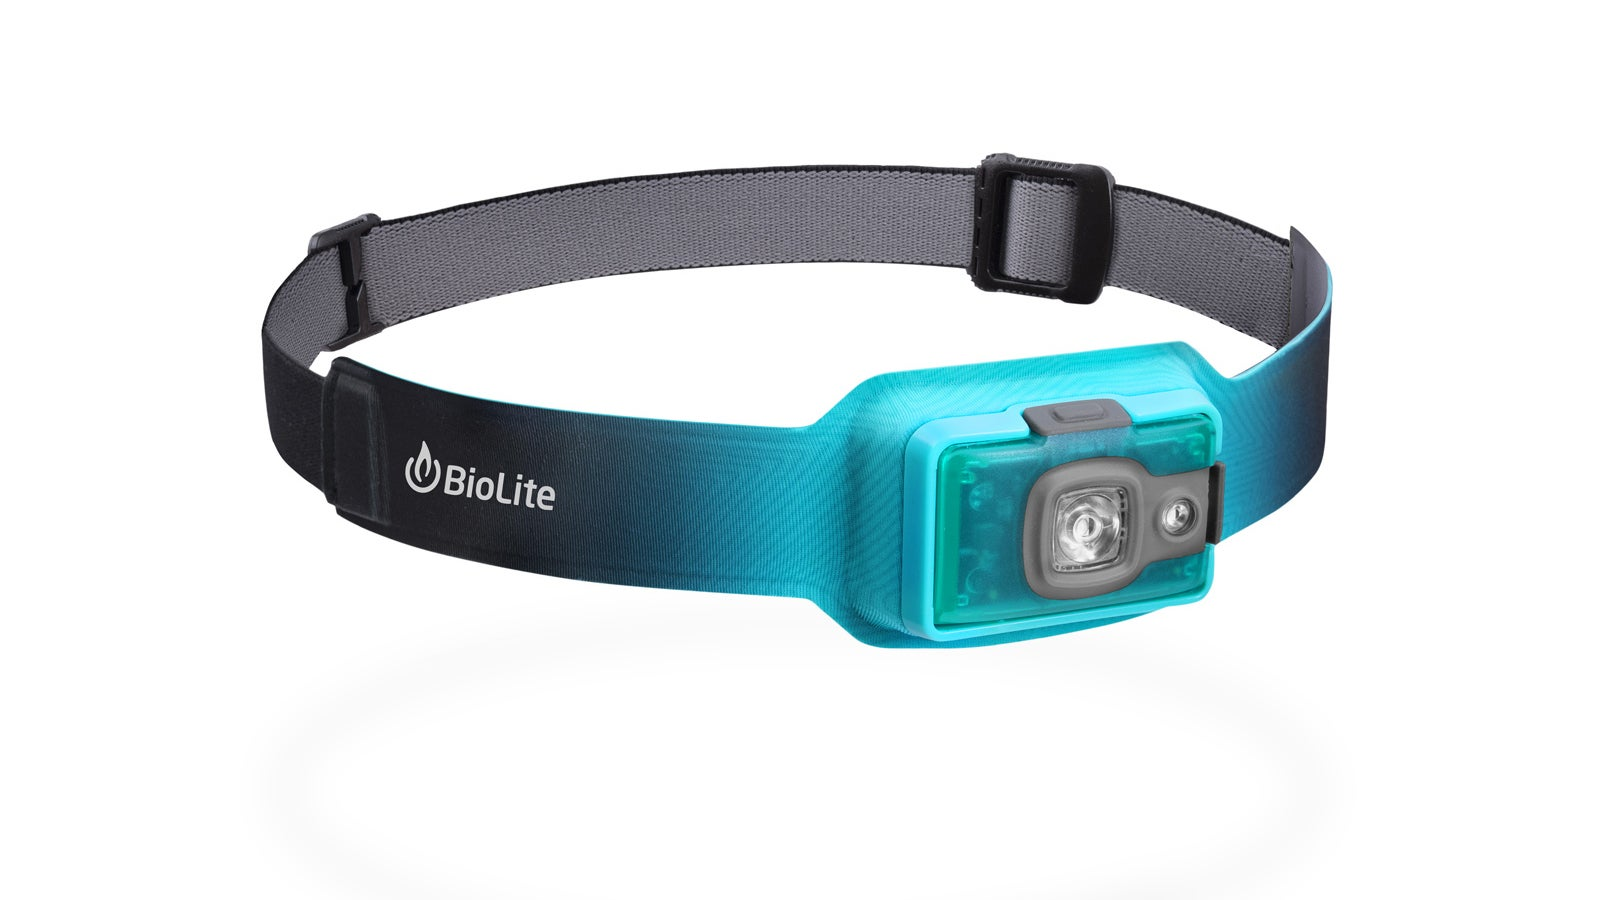 BioLite small headlamp